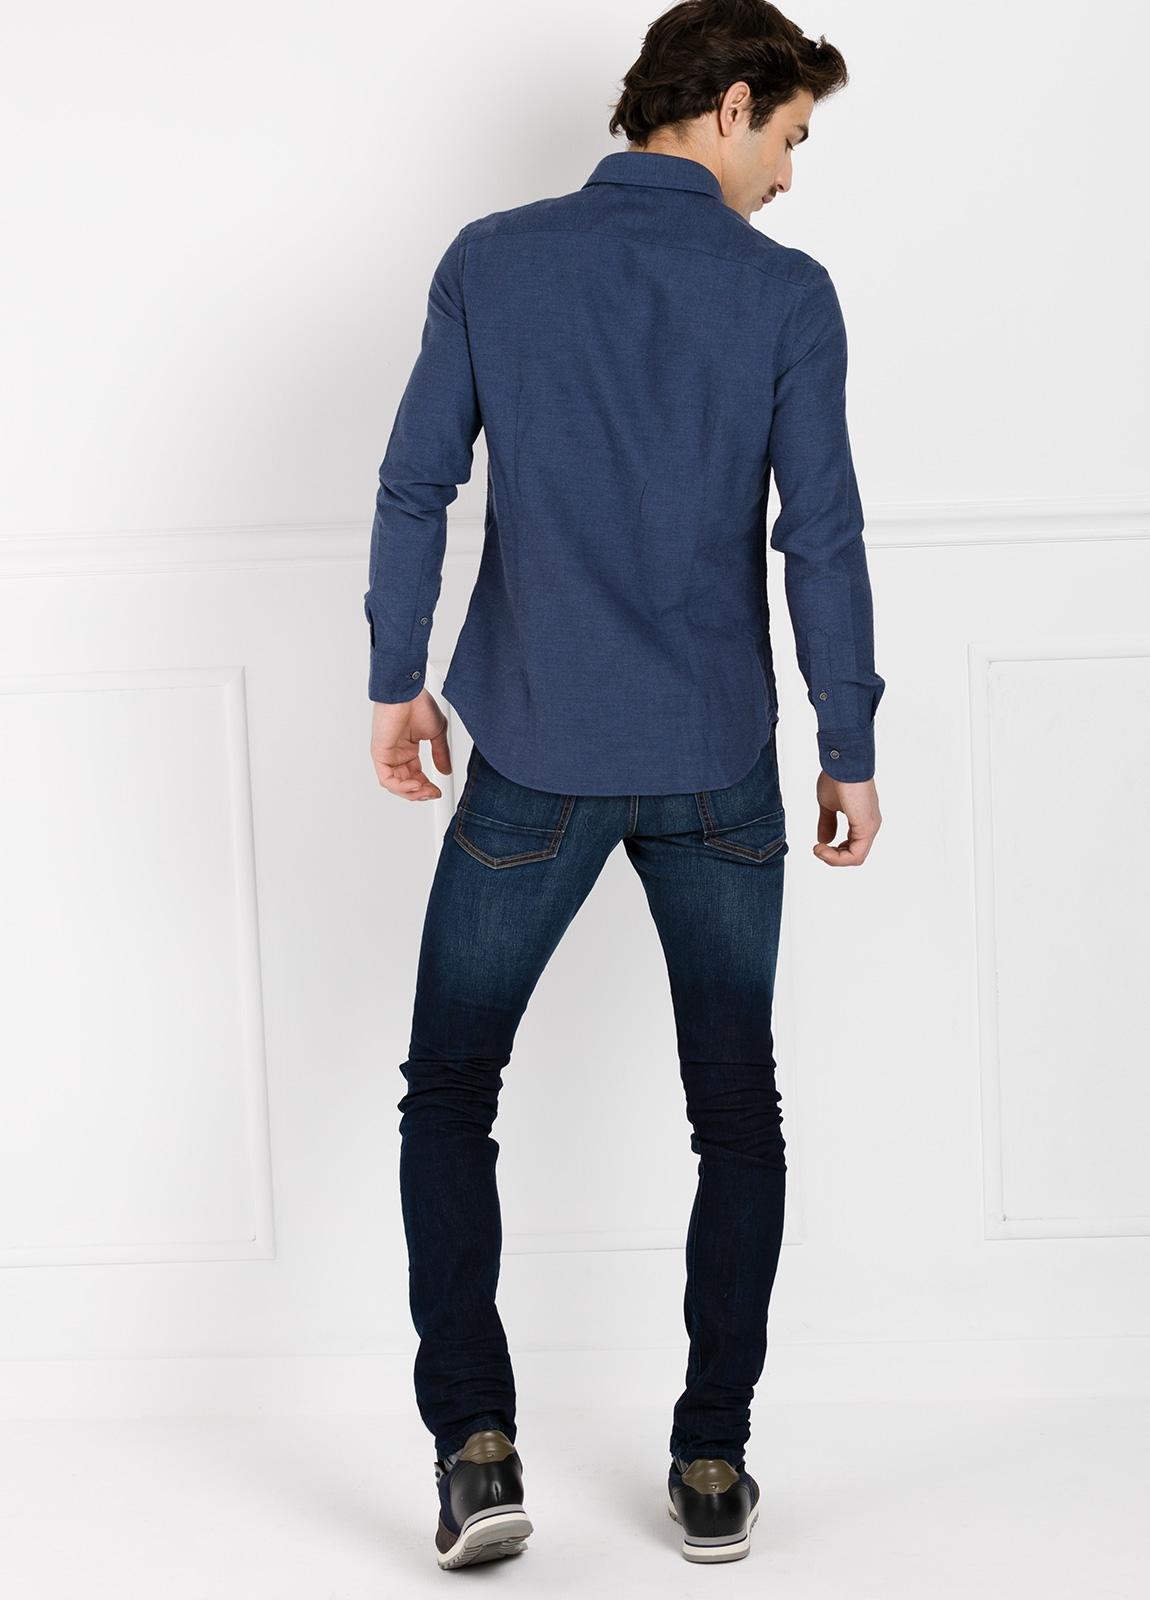 Camisa Leisure Wear SLIM FIT modelo PORTO diseño liso color azul marino. 100% Algodón. - Ítem1